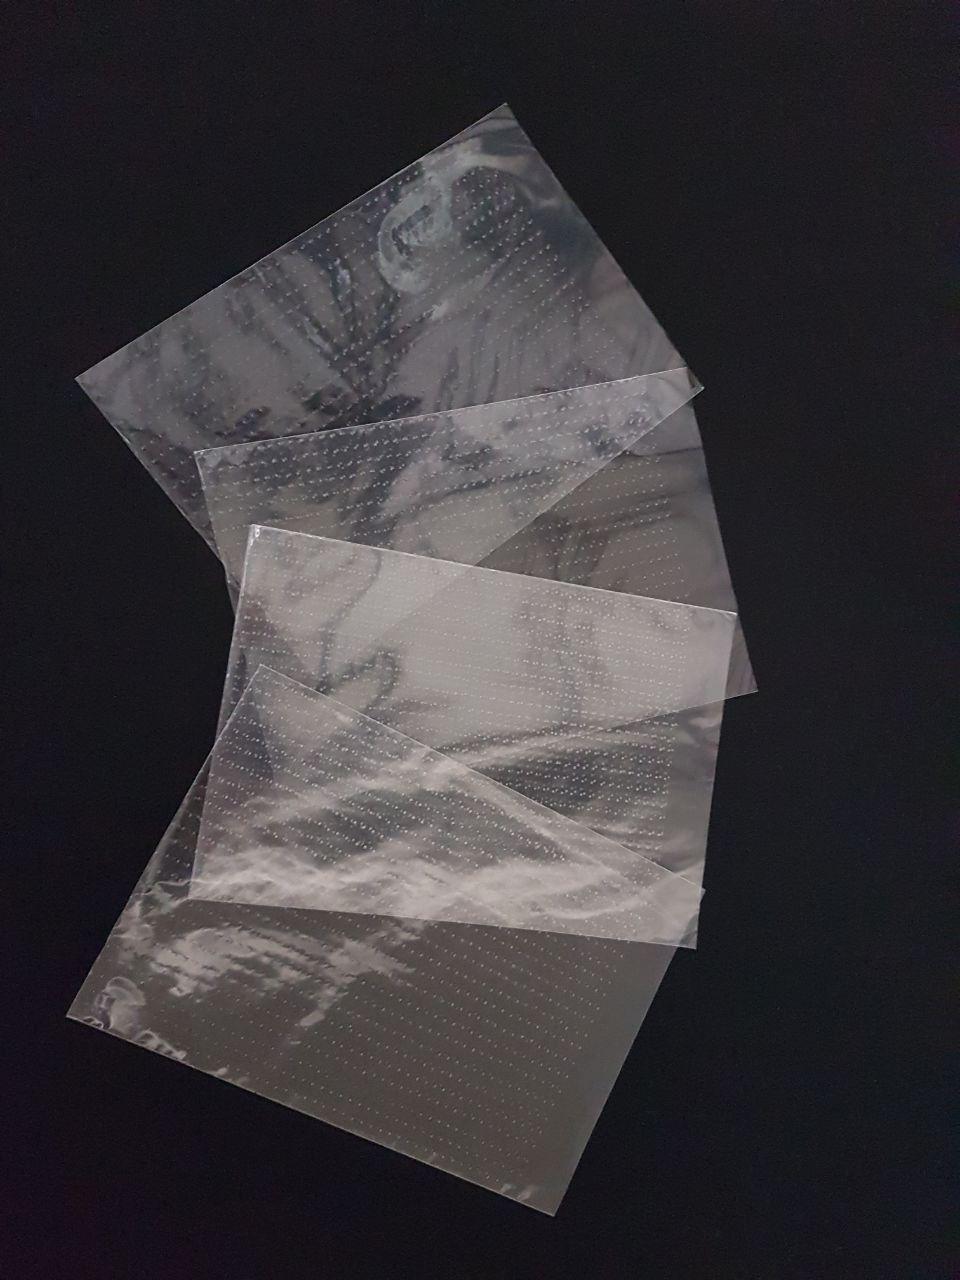 801ab3217 Bolsa Microperforada Transp. con tape6 - Concisa Guatemala